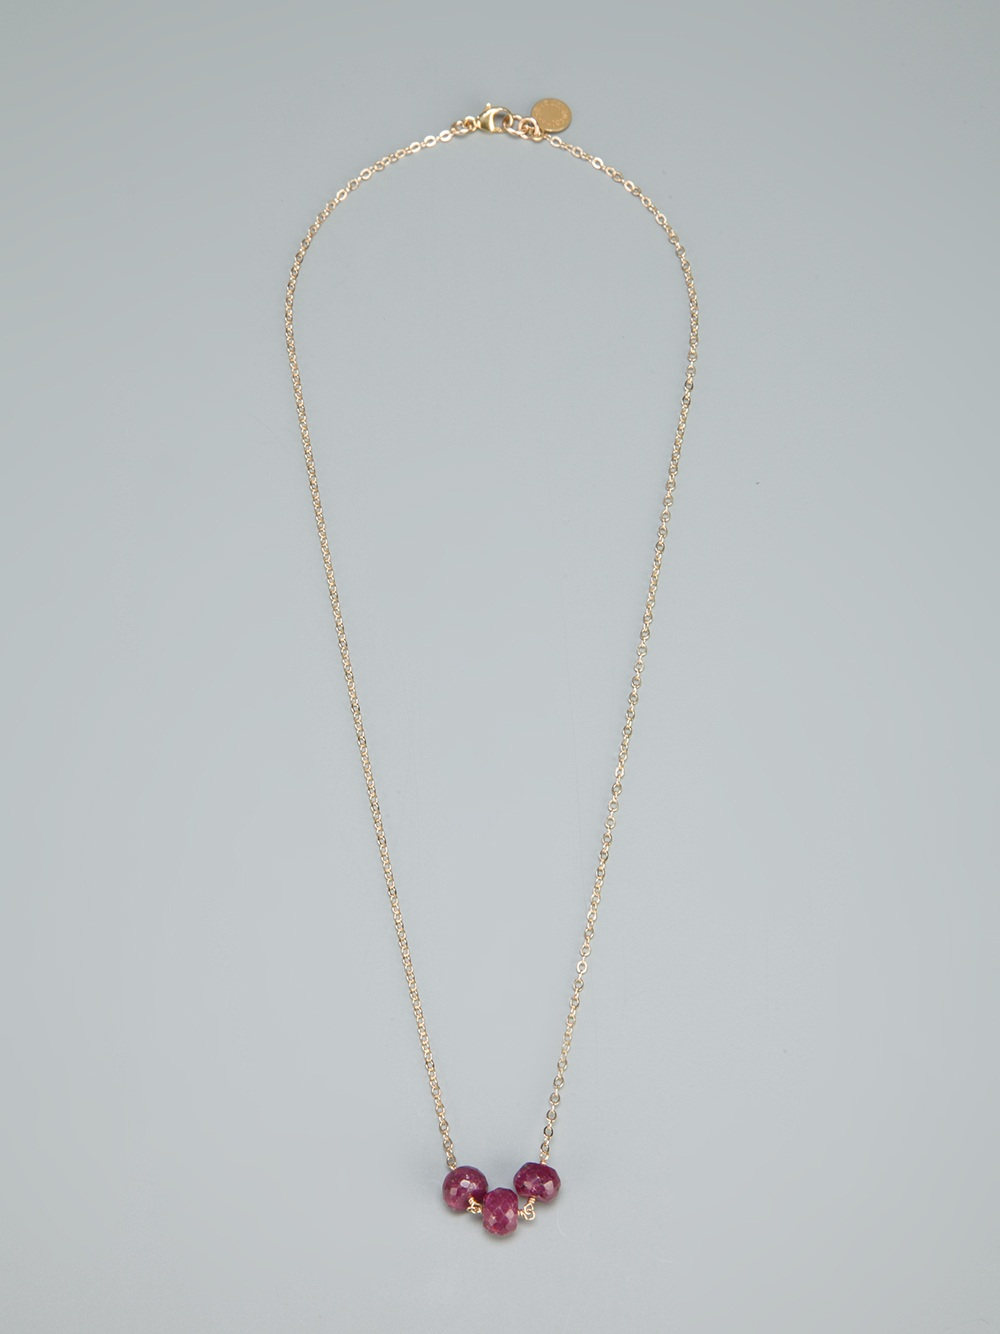 Catherine weitzman Pendant Necklace in Purple